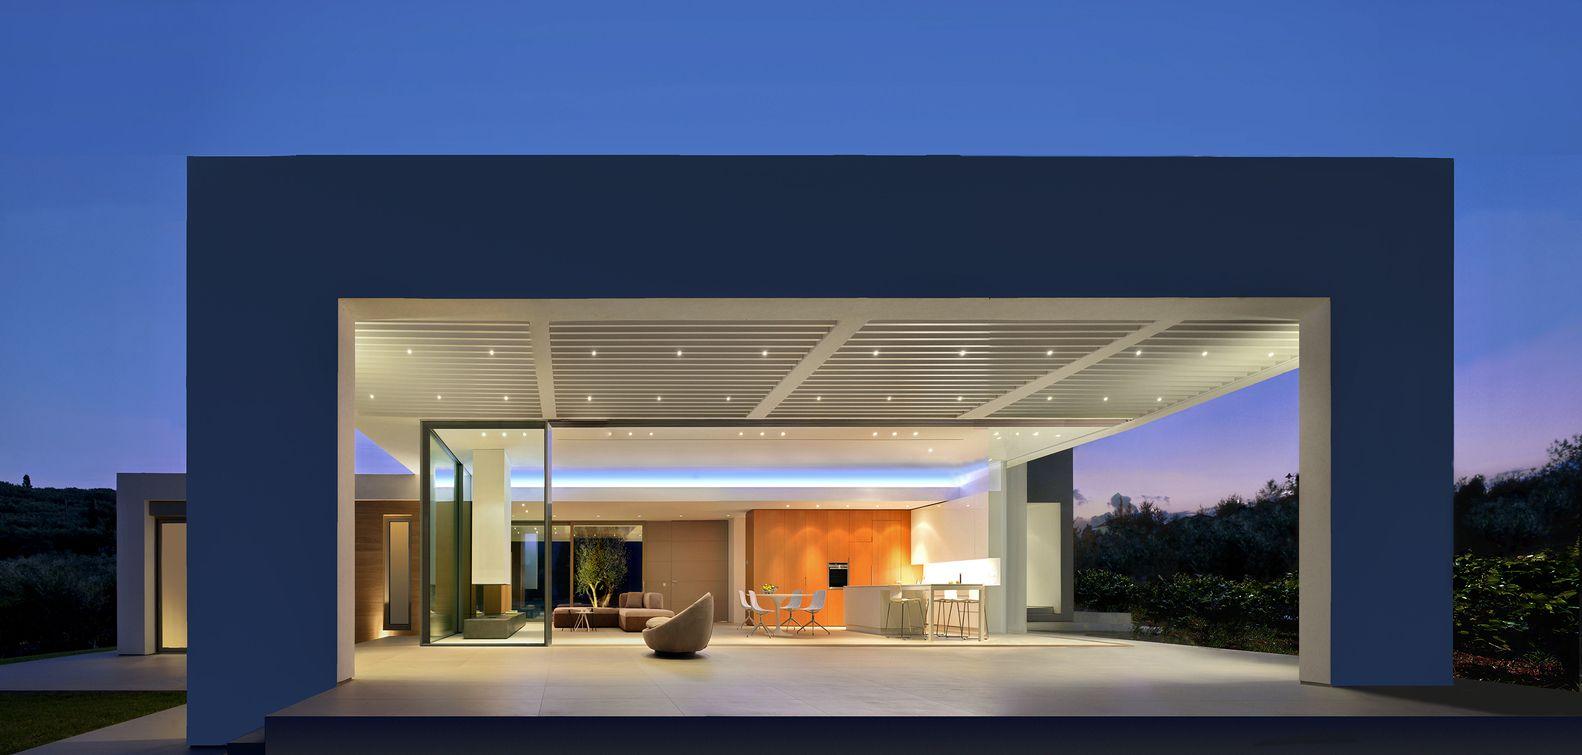 Modern Architecture Greece gallery of house in zakynthos / katerina valsamaki architects - 5